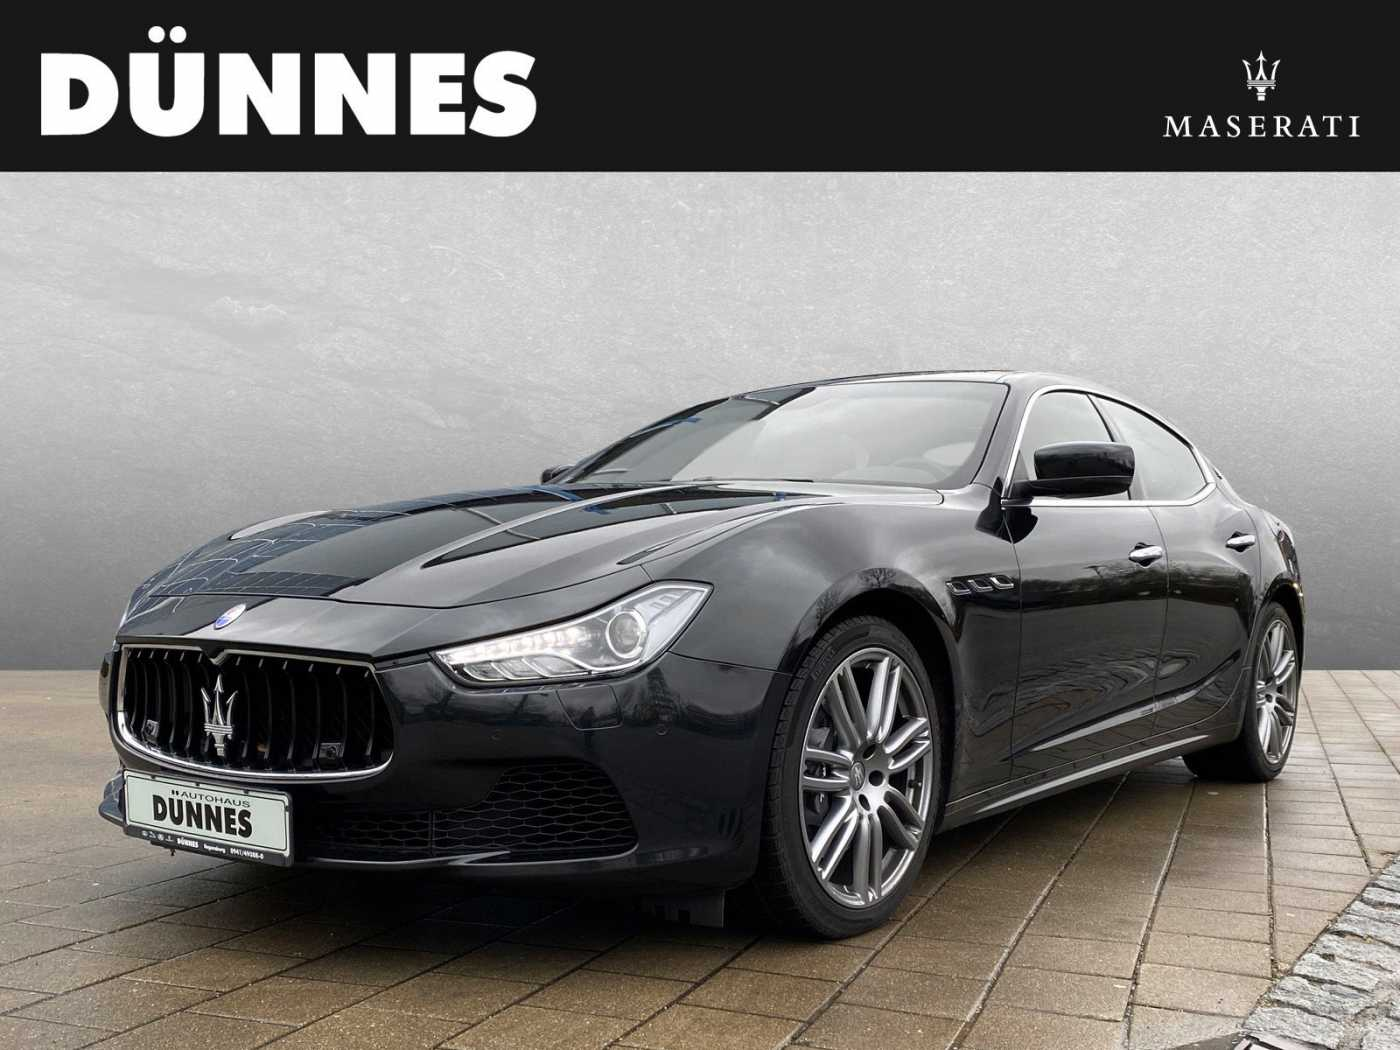 Maserati Ghibli Automatik S Q4 - Business Plus, 19', Panorama - AKTION - Maserati Regensburg, Jahr 2015, Benzin